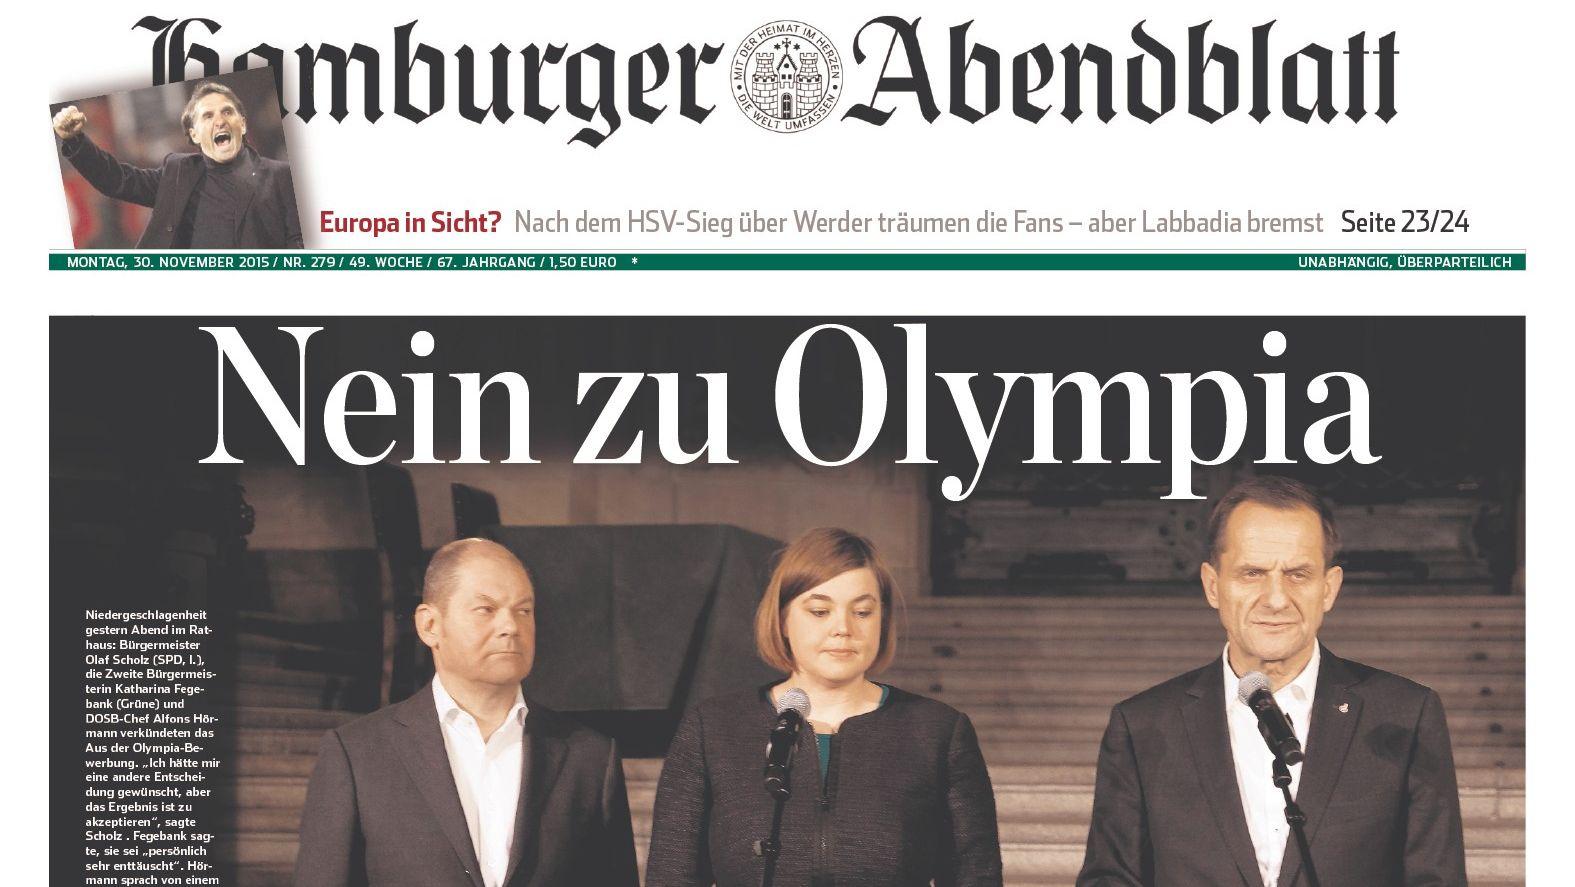 Hamburger Abendblatt Das Tägliche Kreuzworträtsel